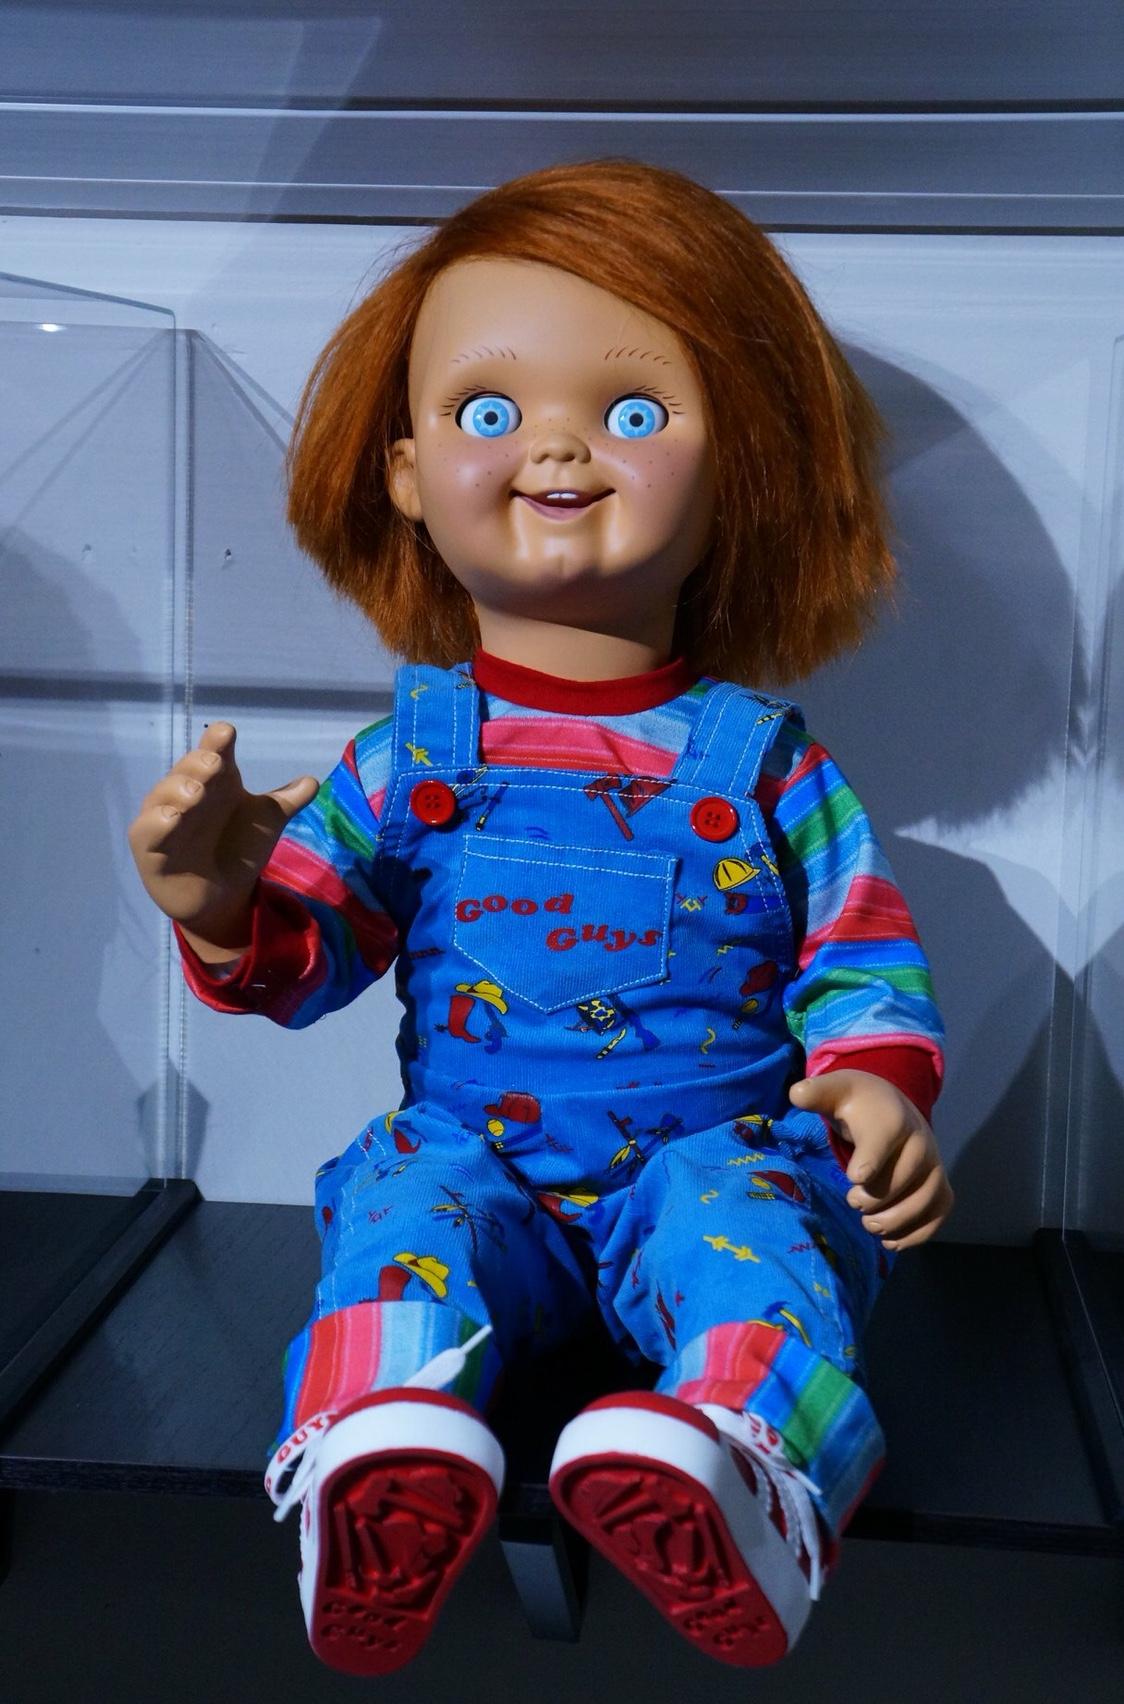 Garrett Zima Lifesize Good Guy Doll Jpg 1124x1704 1980 Chucky